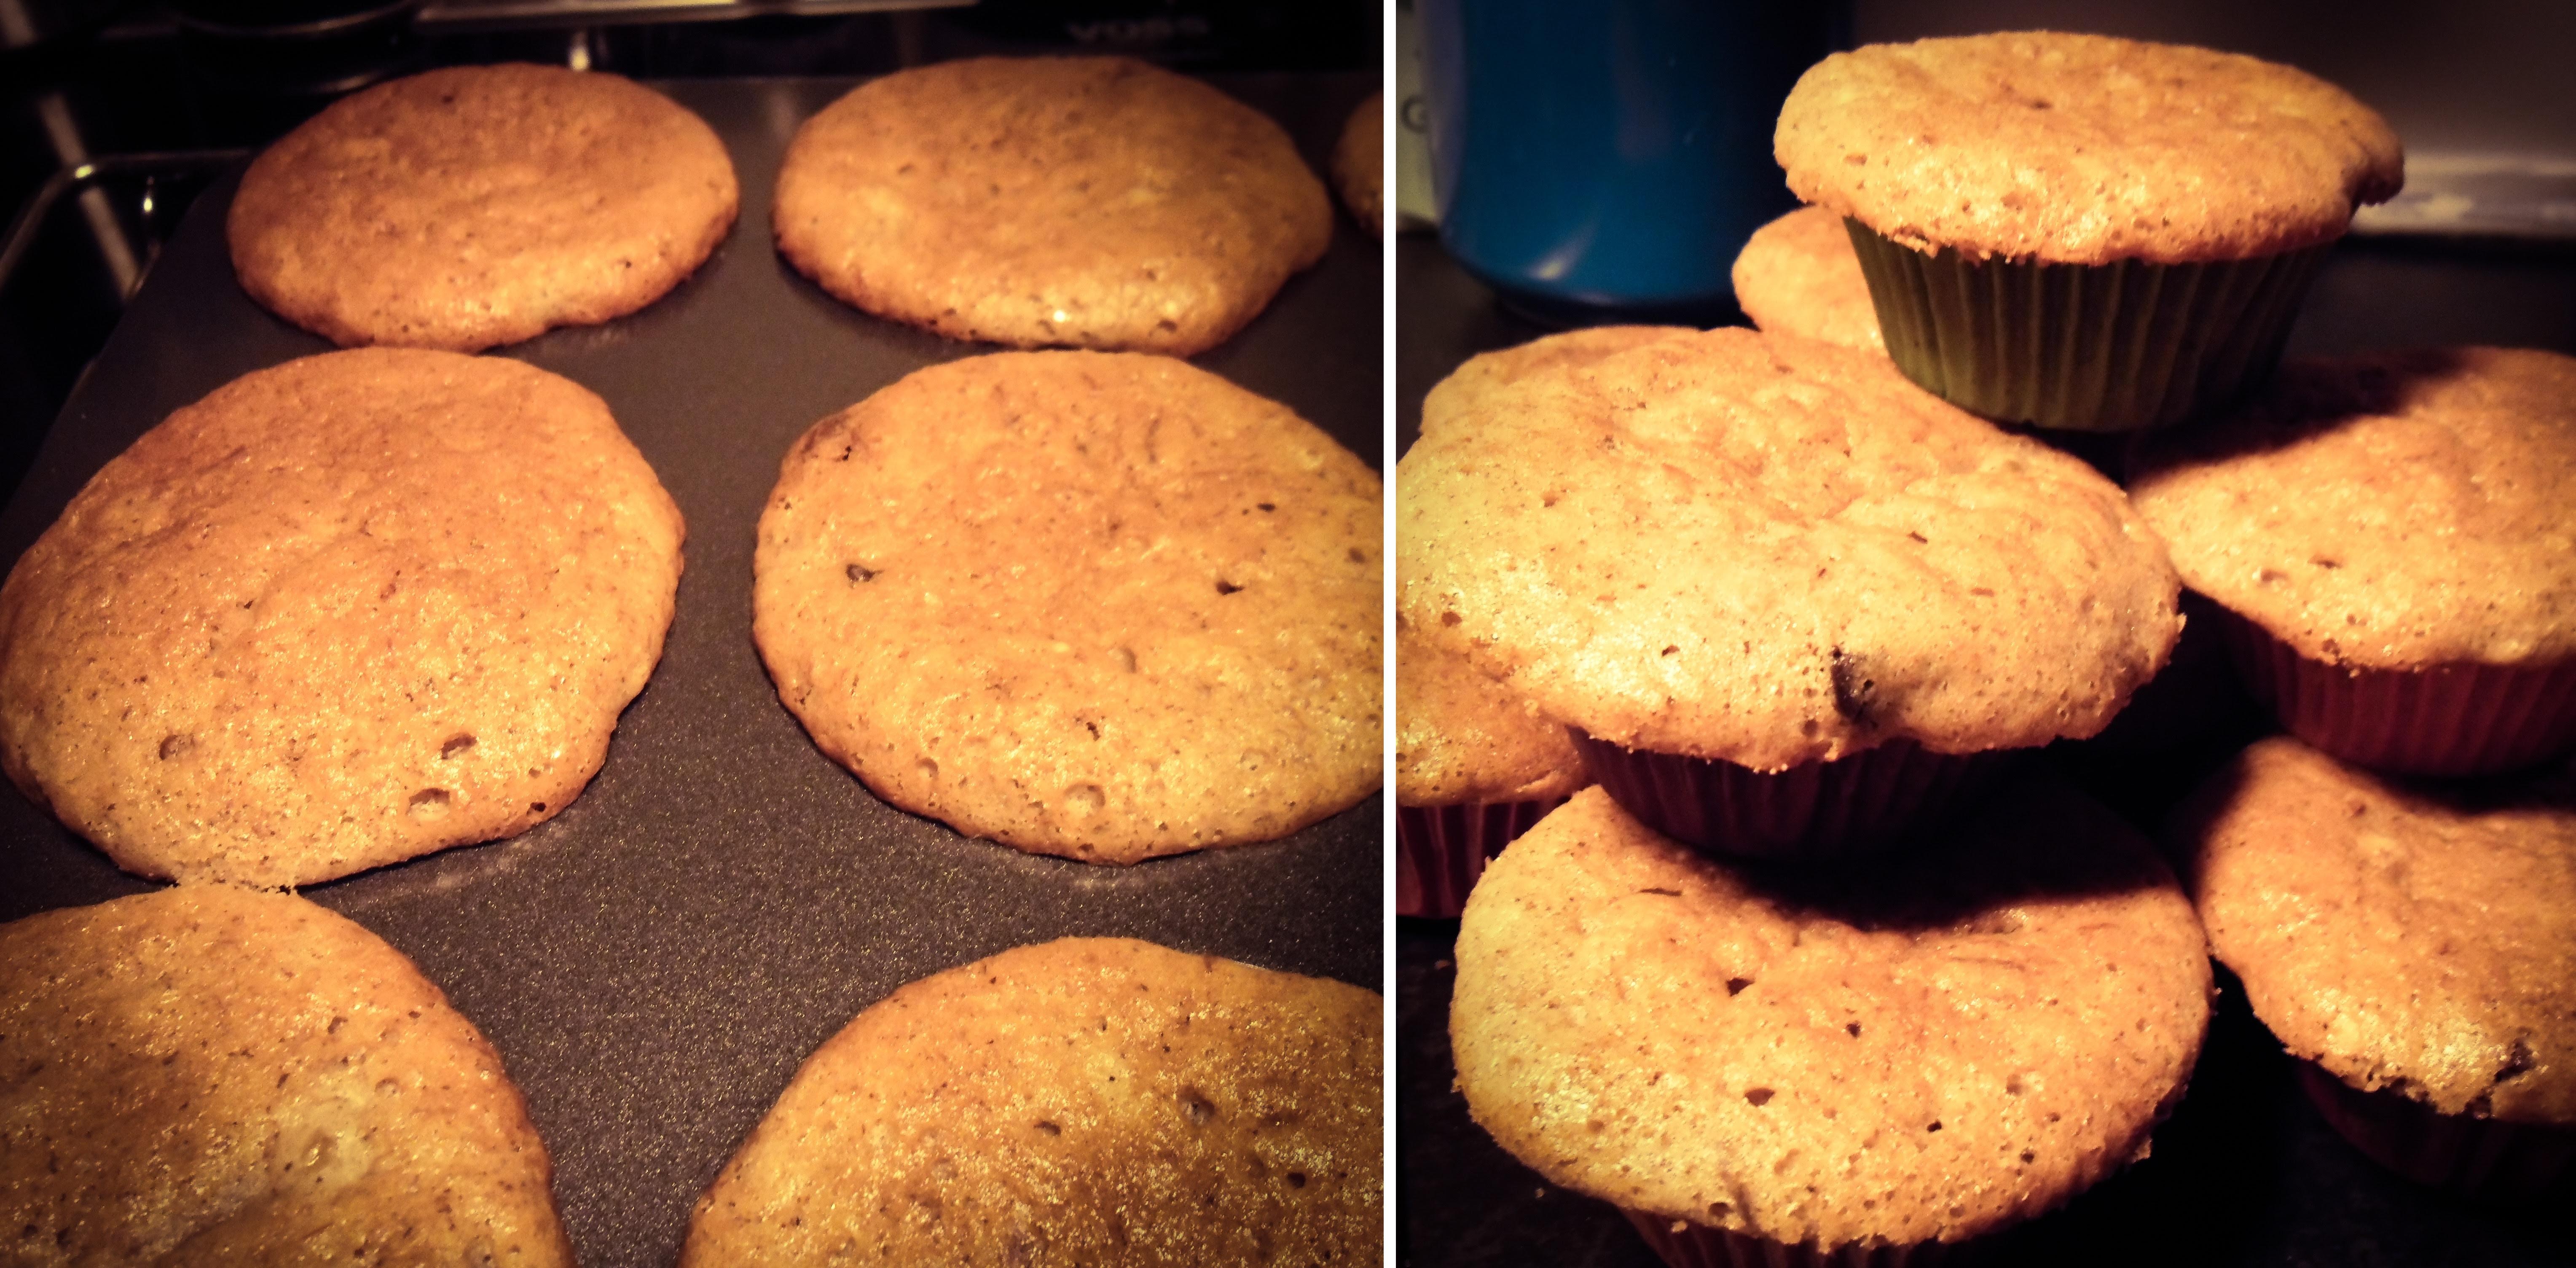 http://opholdsrum.wordpress.com/2013/11/01/madbloggerudfordringen-de-dejligste-tildemad-bananmuffins/